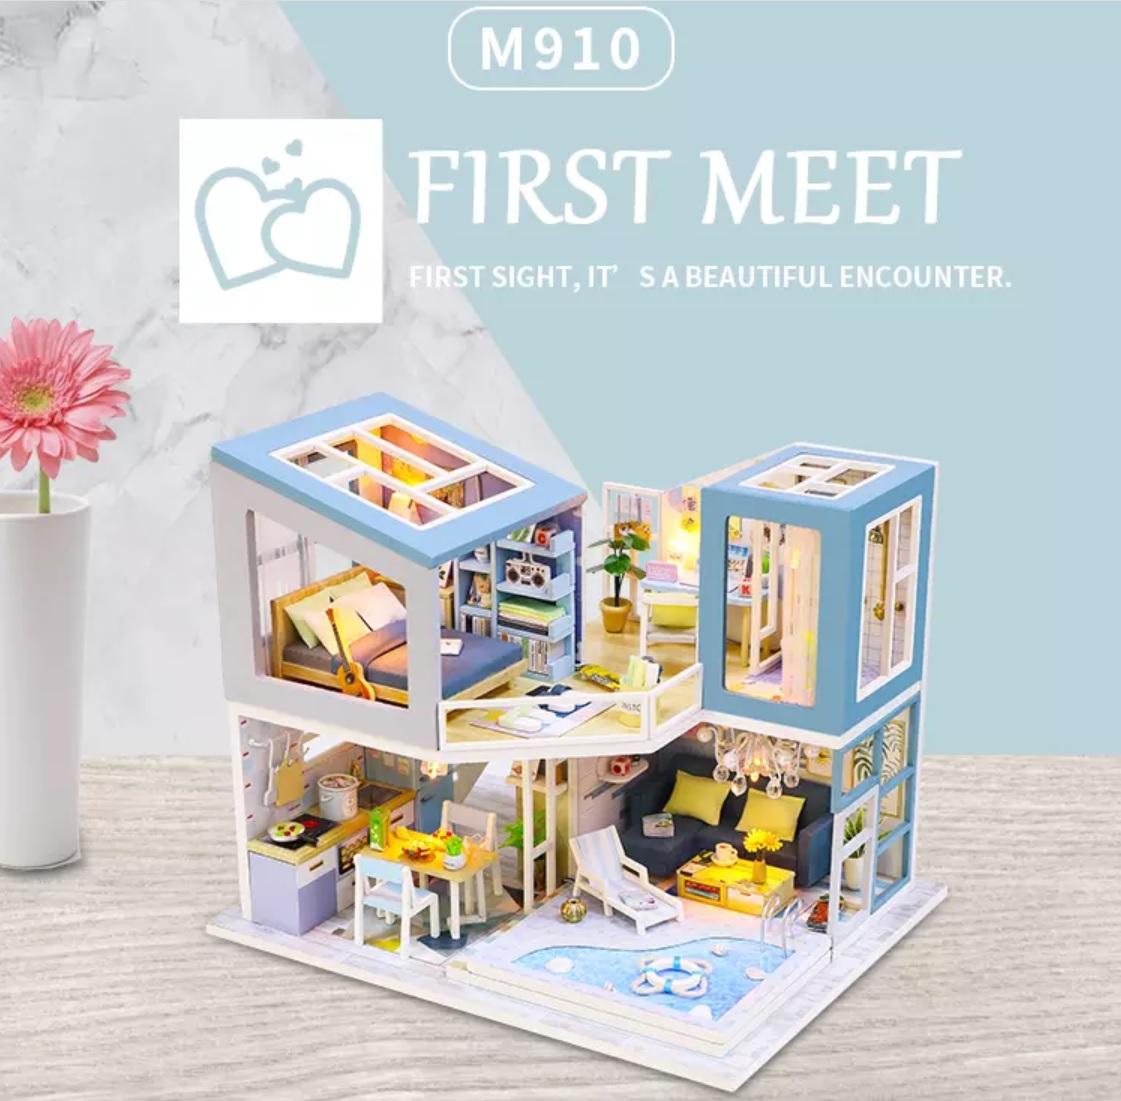 M910 Product Image